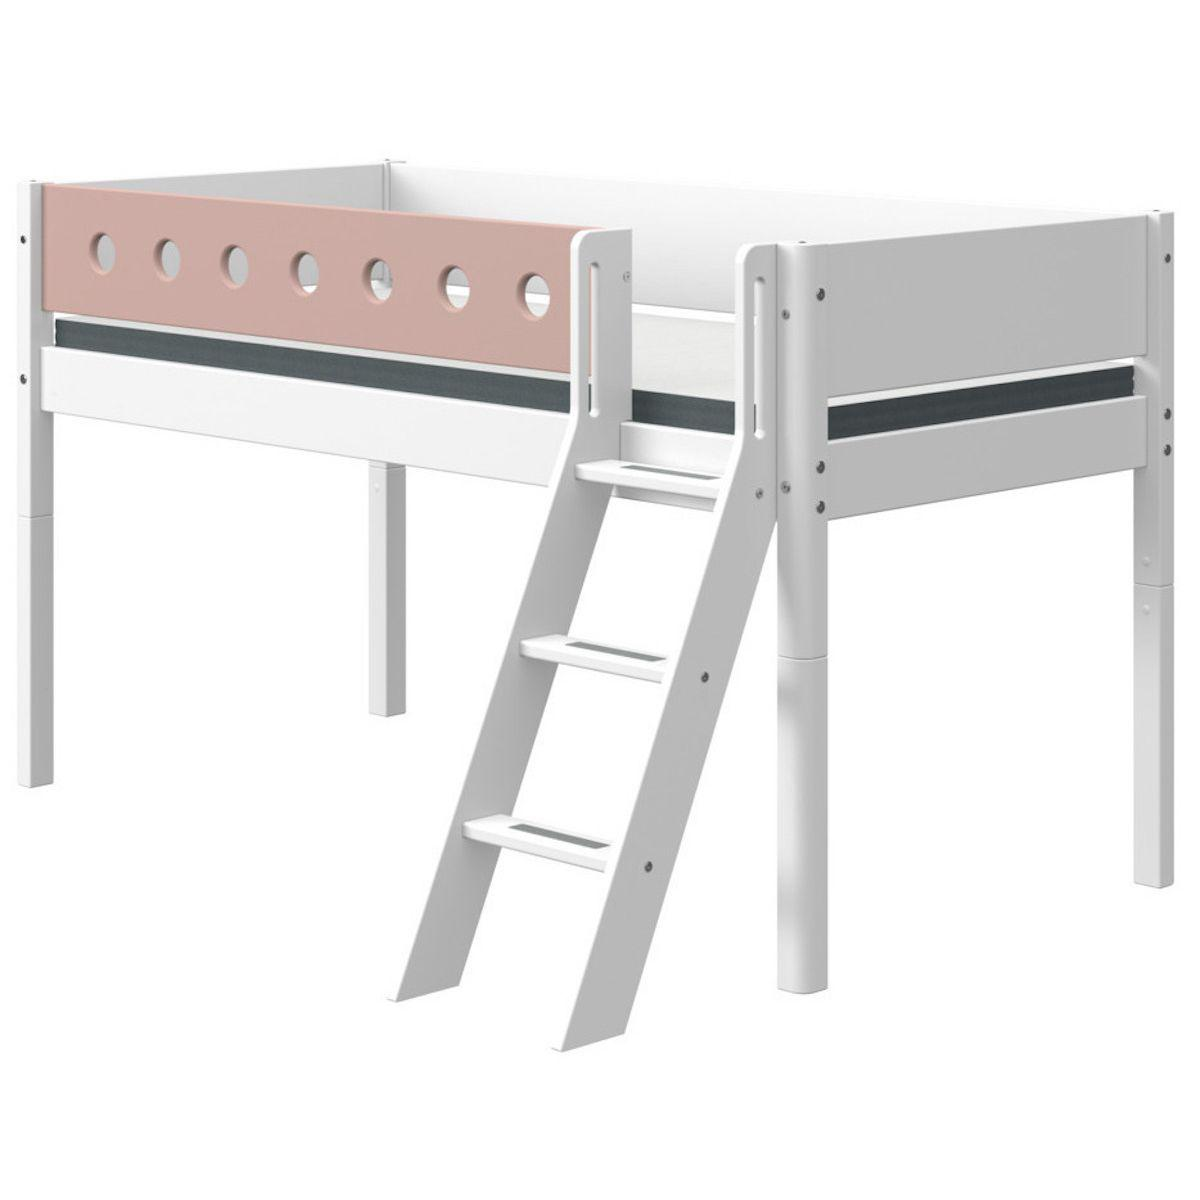 Cama media alta 90x190cm escalera inclinada WHITE Flexa blanco-rosa claro